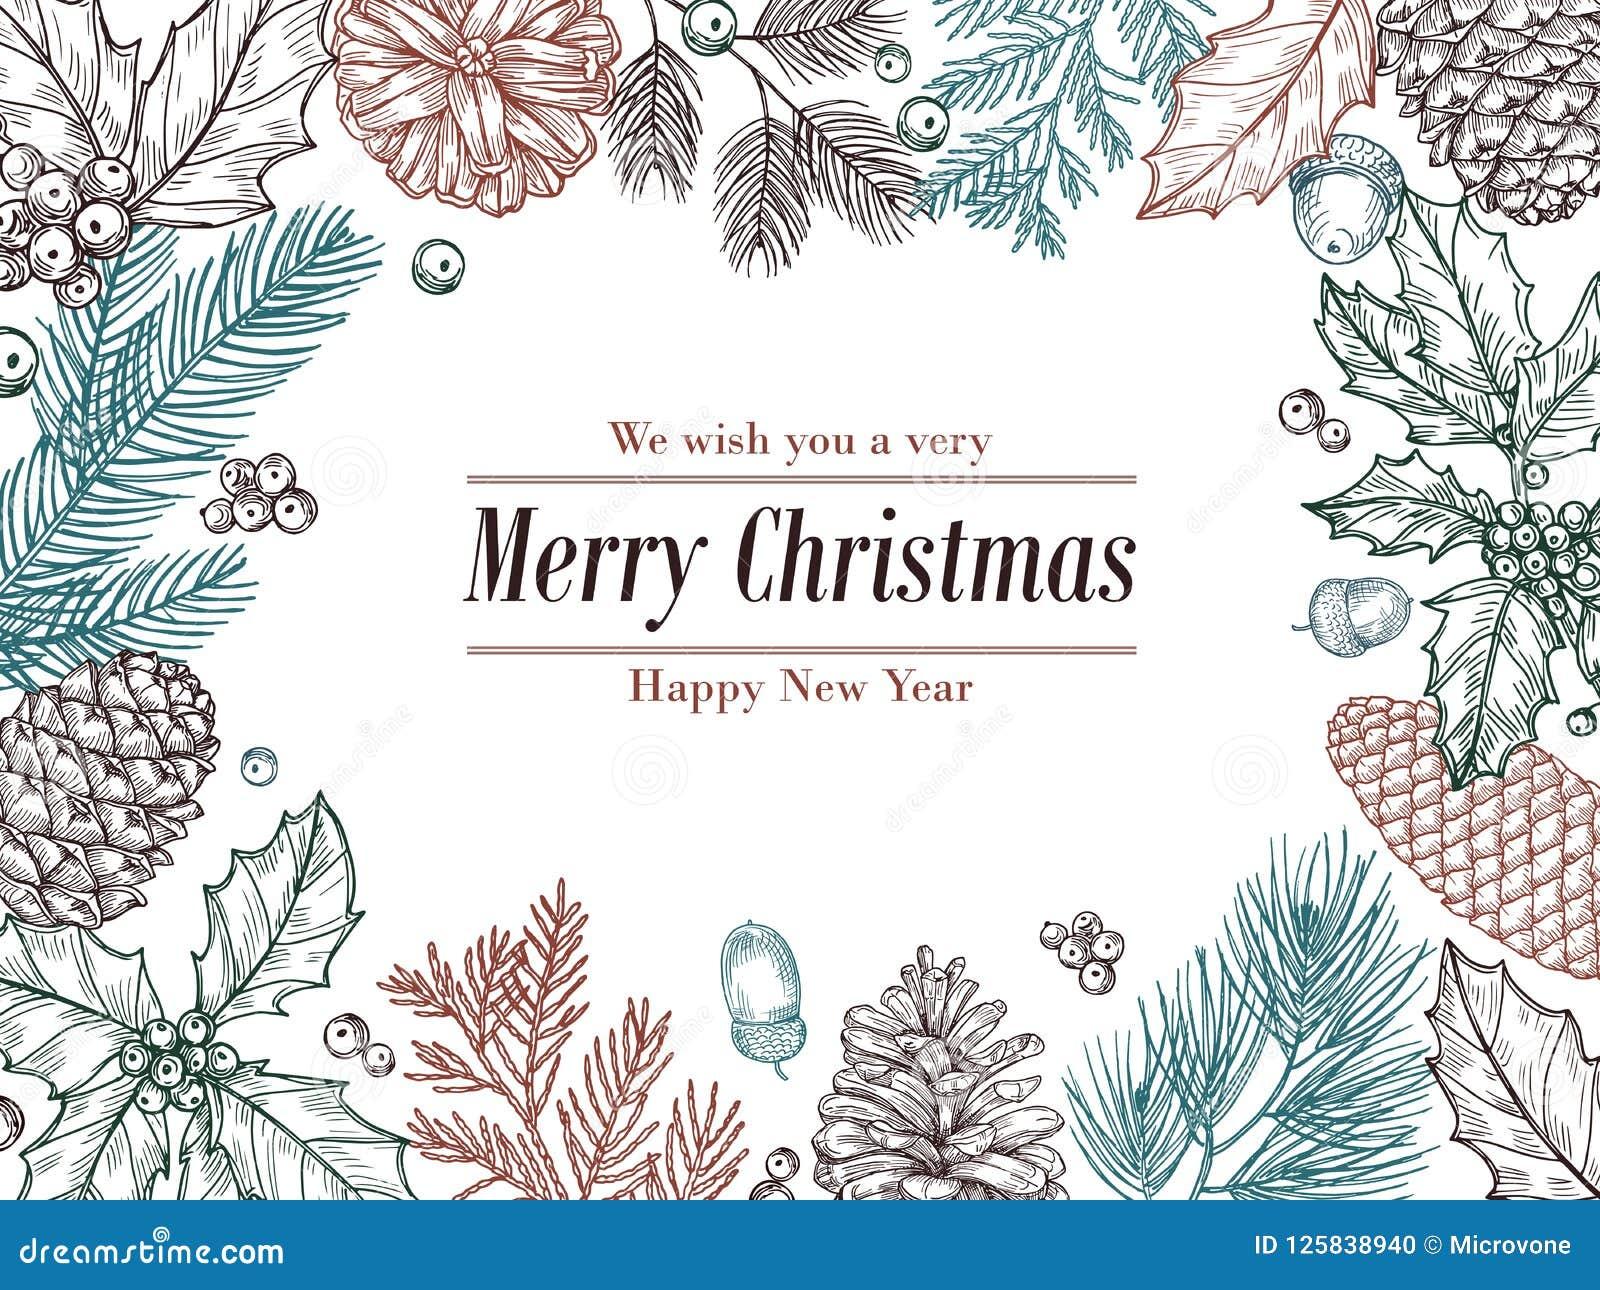 Christmas vintage invitation. Winter fir pine branches, pinecones floral border. Christmas, xmas botanical sketch frame